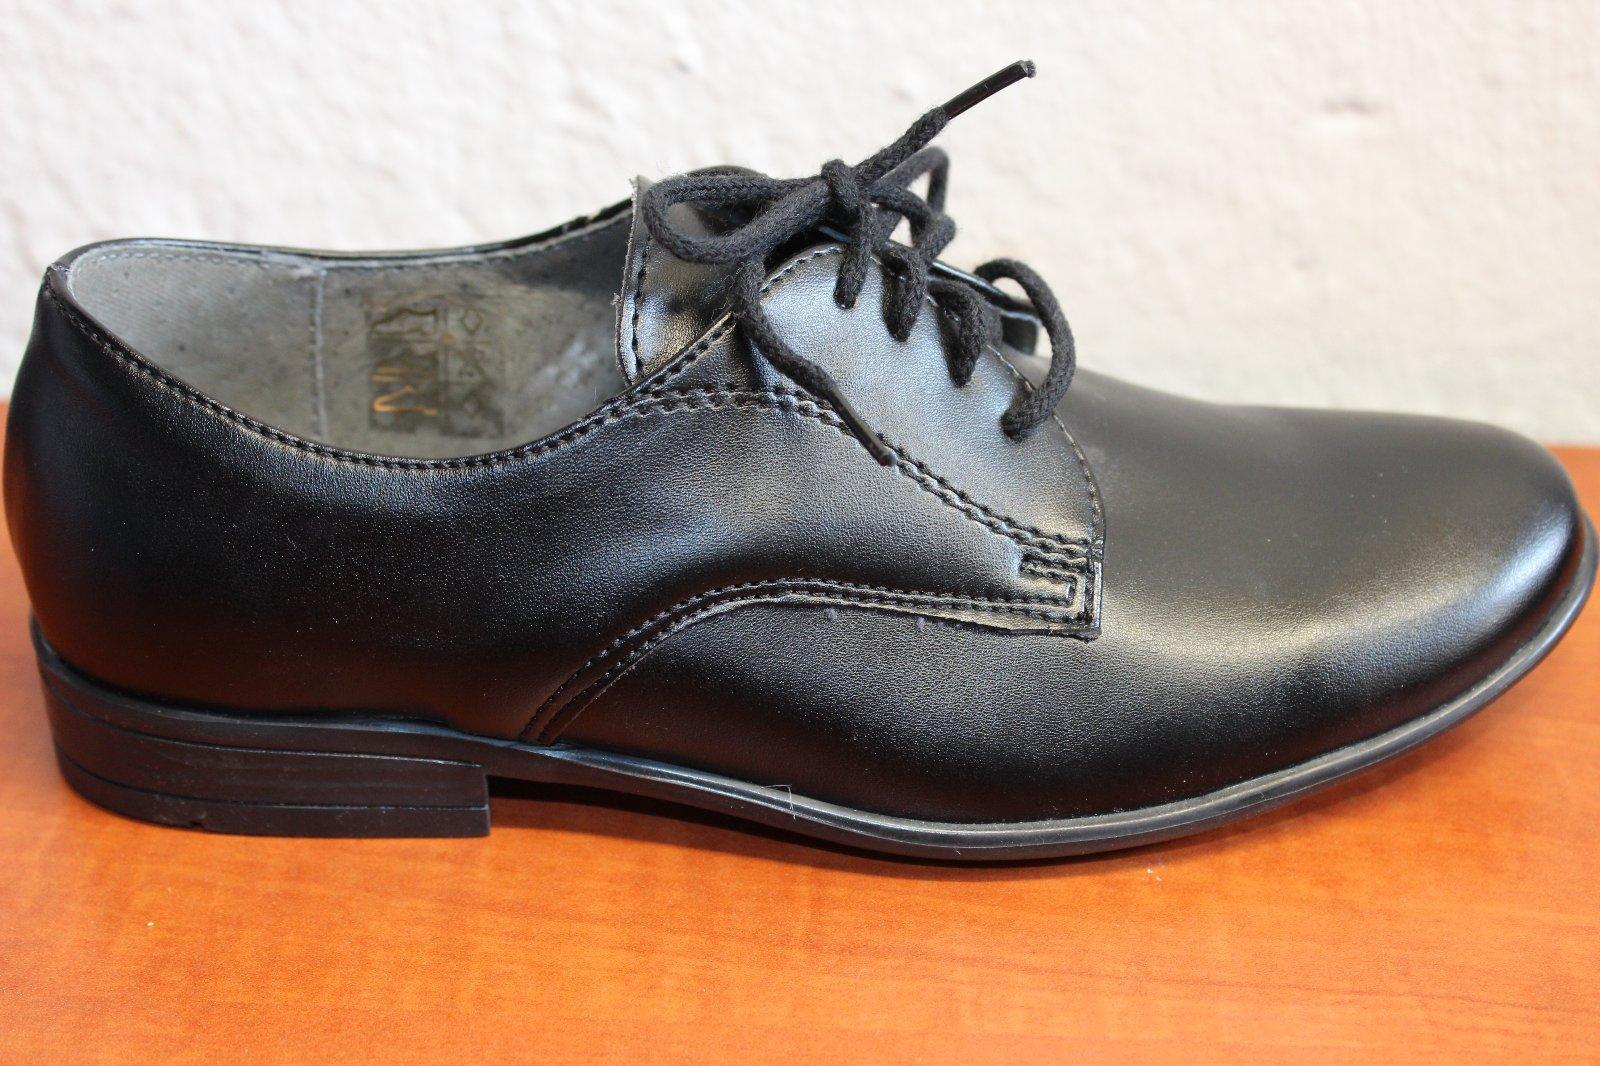 593b322076 Chlapčenské spoločenské topánky 9616 b